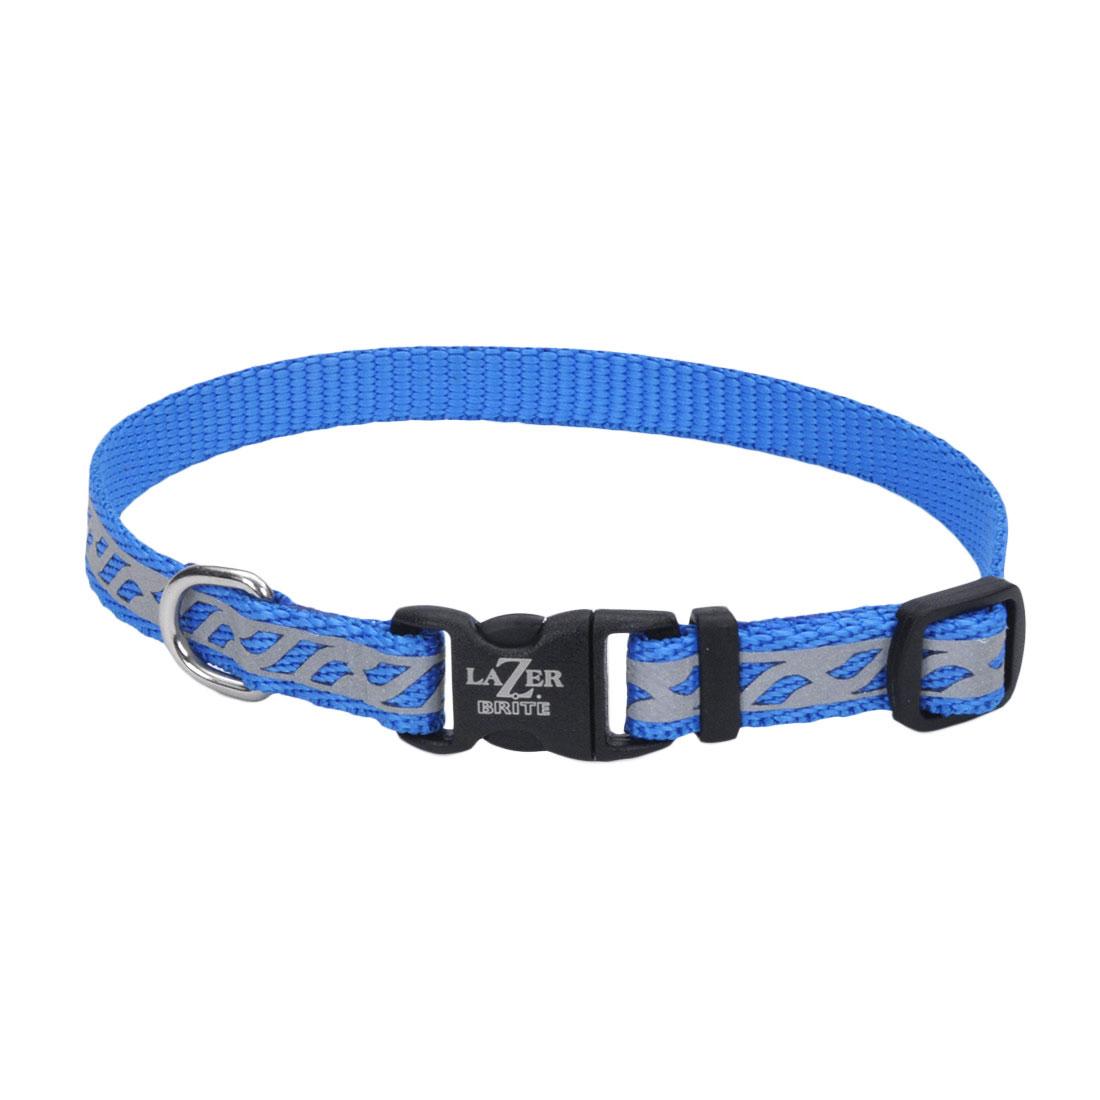 Lazer Brite Reflective Open-Design Adjustable Collar, Blue Lagoon Wave, 3/8-in x 8-in-12-in